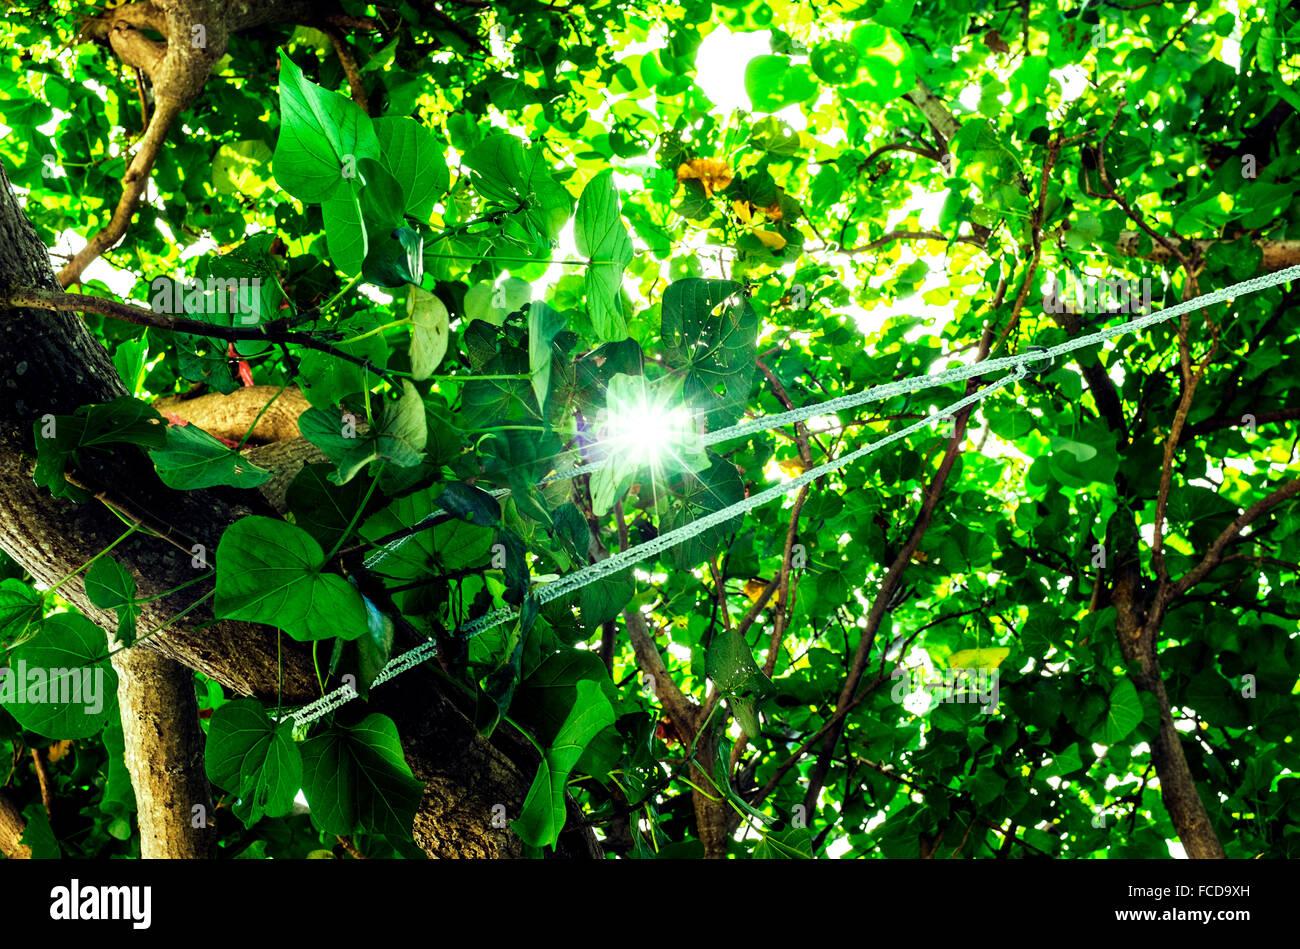 Sun Flaring Through Leaves - Stock Image